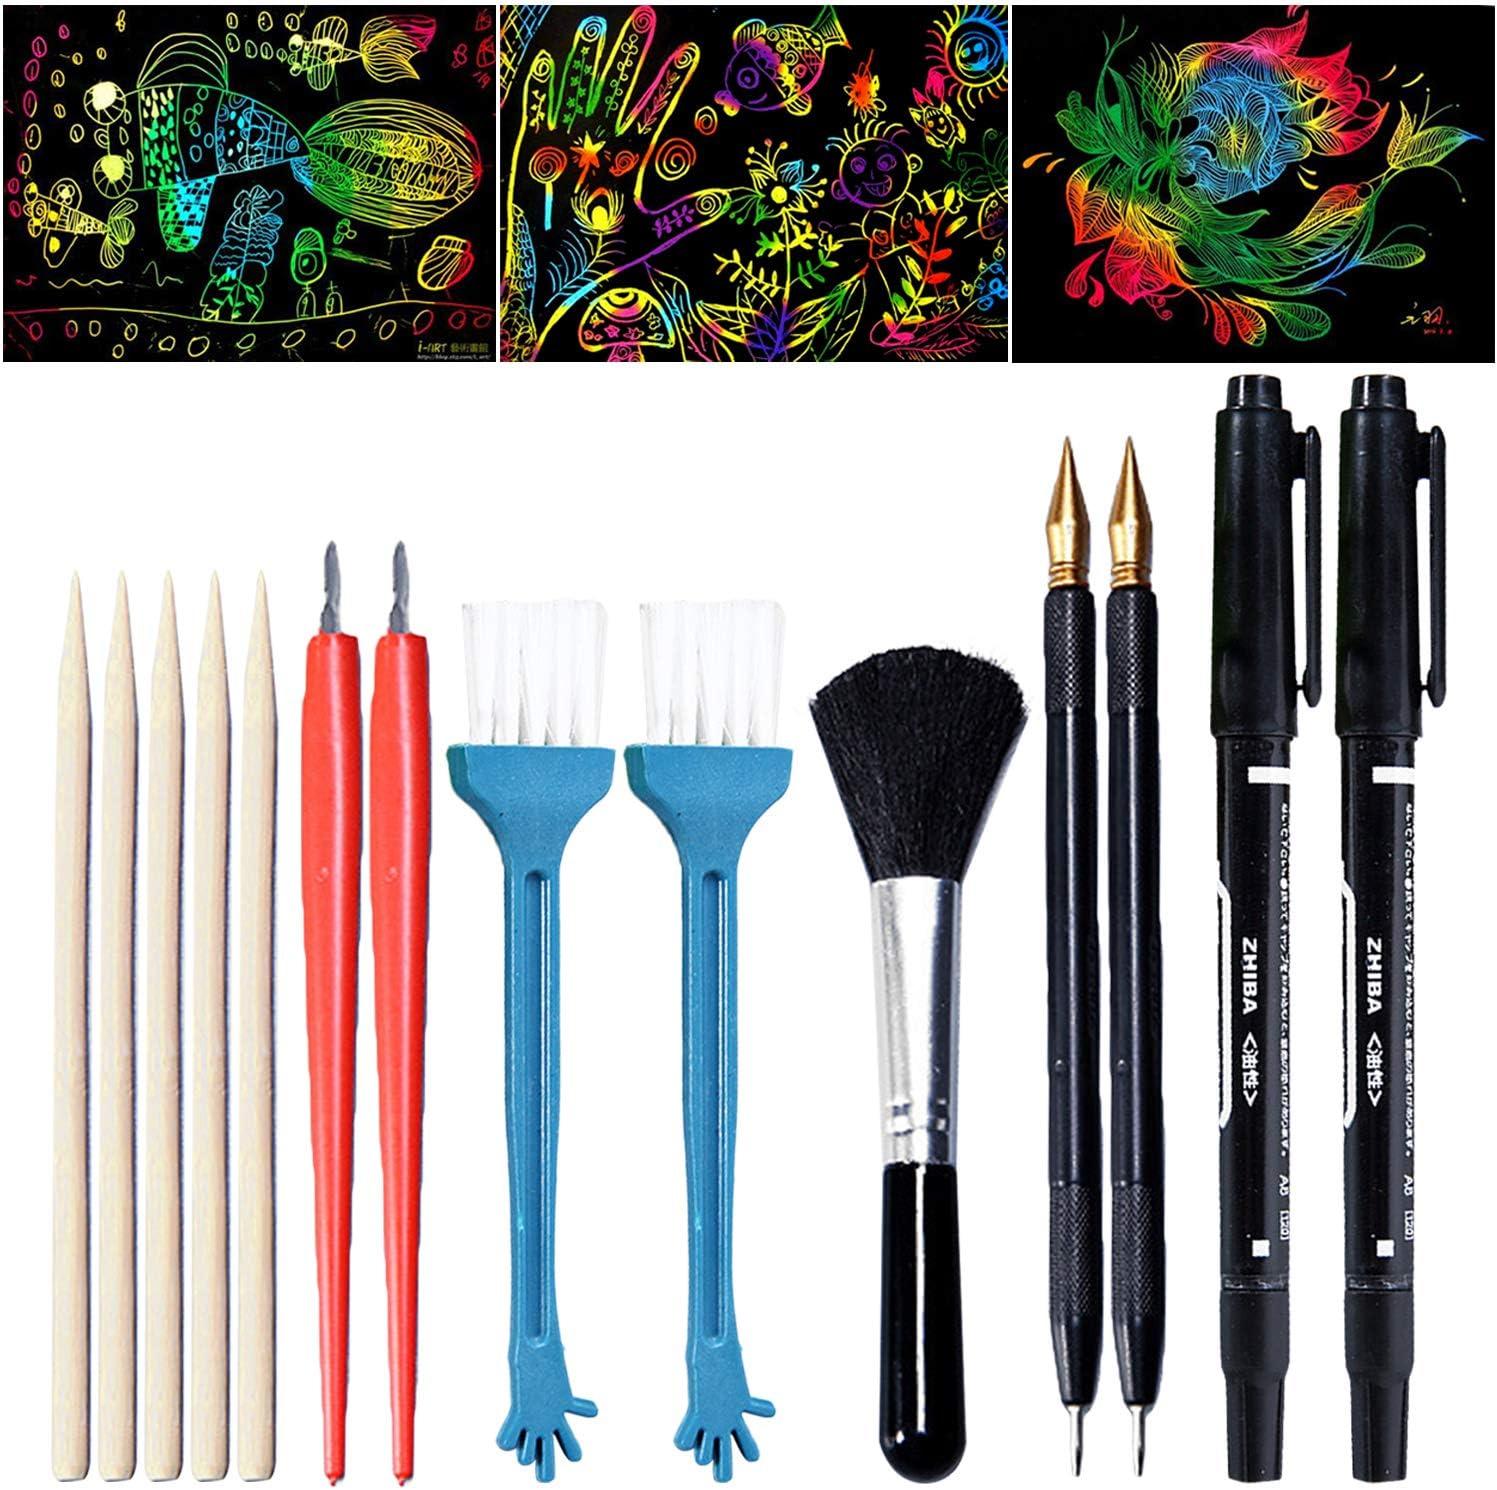 10 Pieces Pink/&White Scratch Color Pen//Scratch Paper Stick Stylus Tools for Kids Art Paper Painting//Coloring Stylus Scratch Paper Art Tool